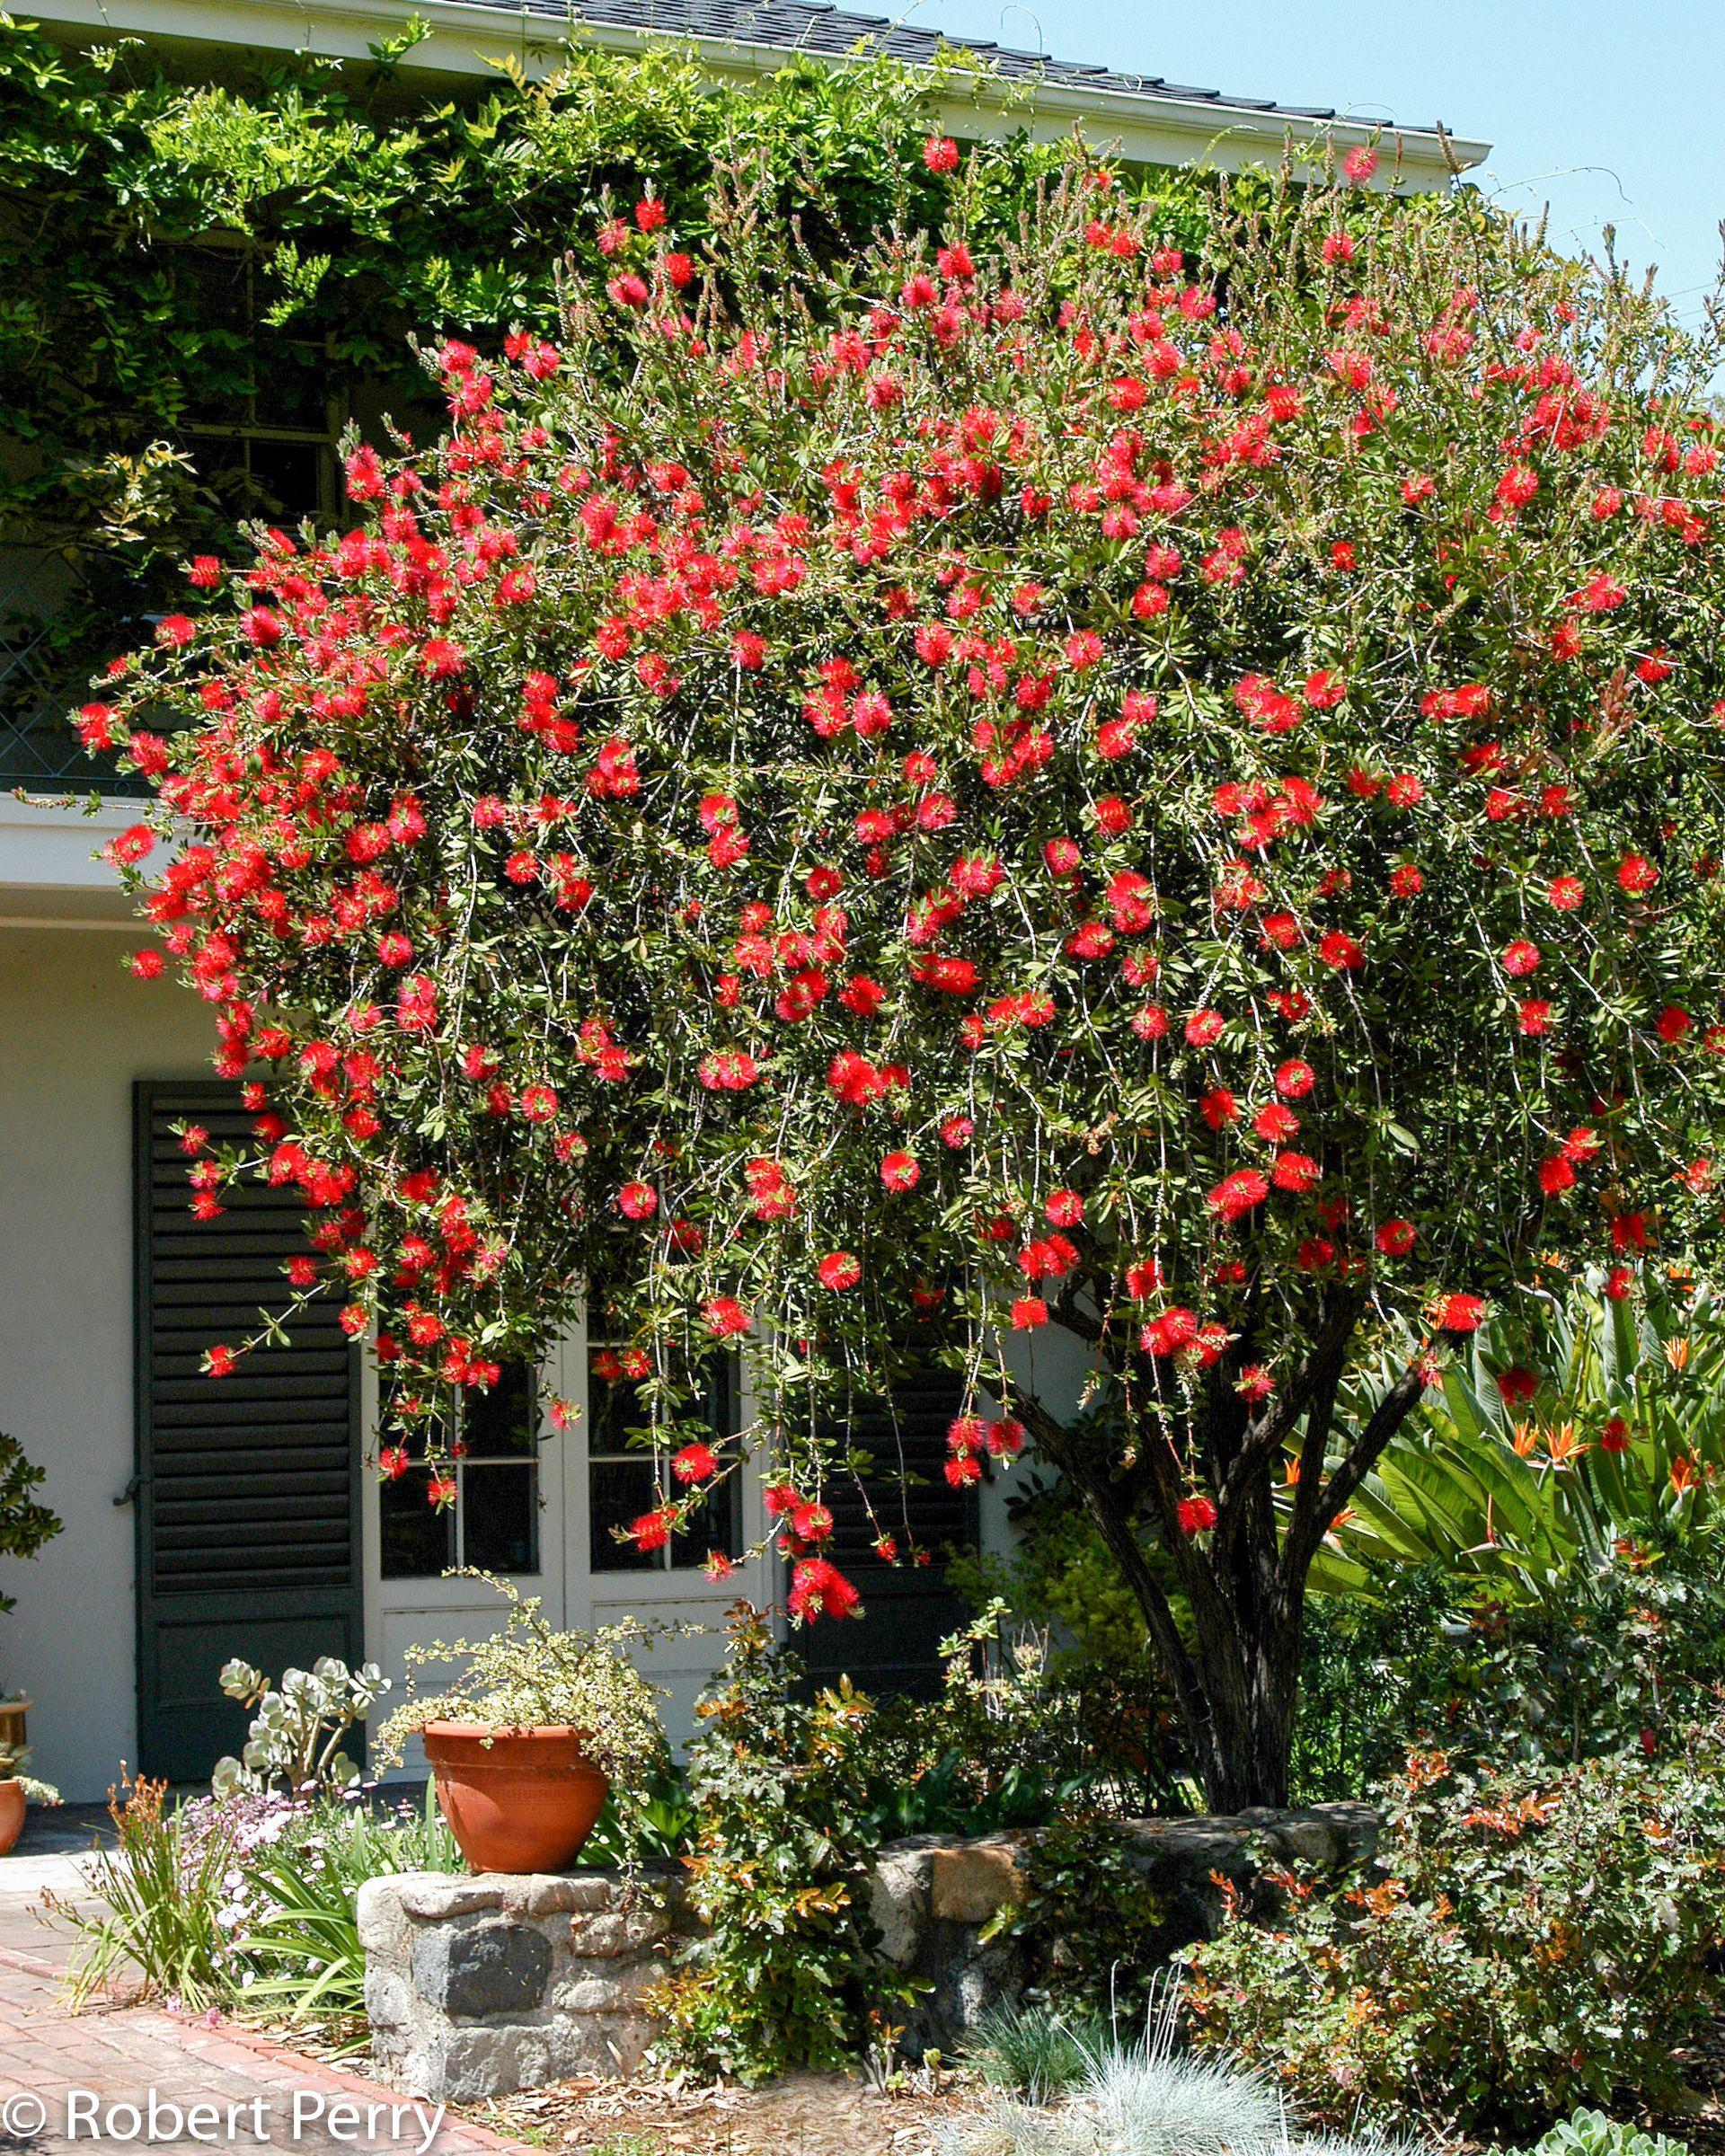 106c8349df9c7daf186237b6ef2ef2ca - Australian Native Trees For Small Gardens